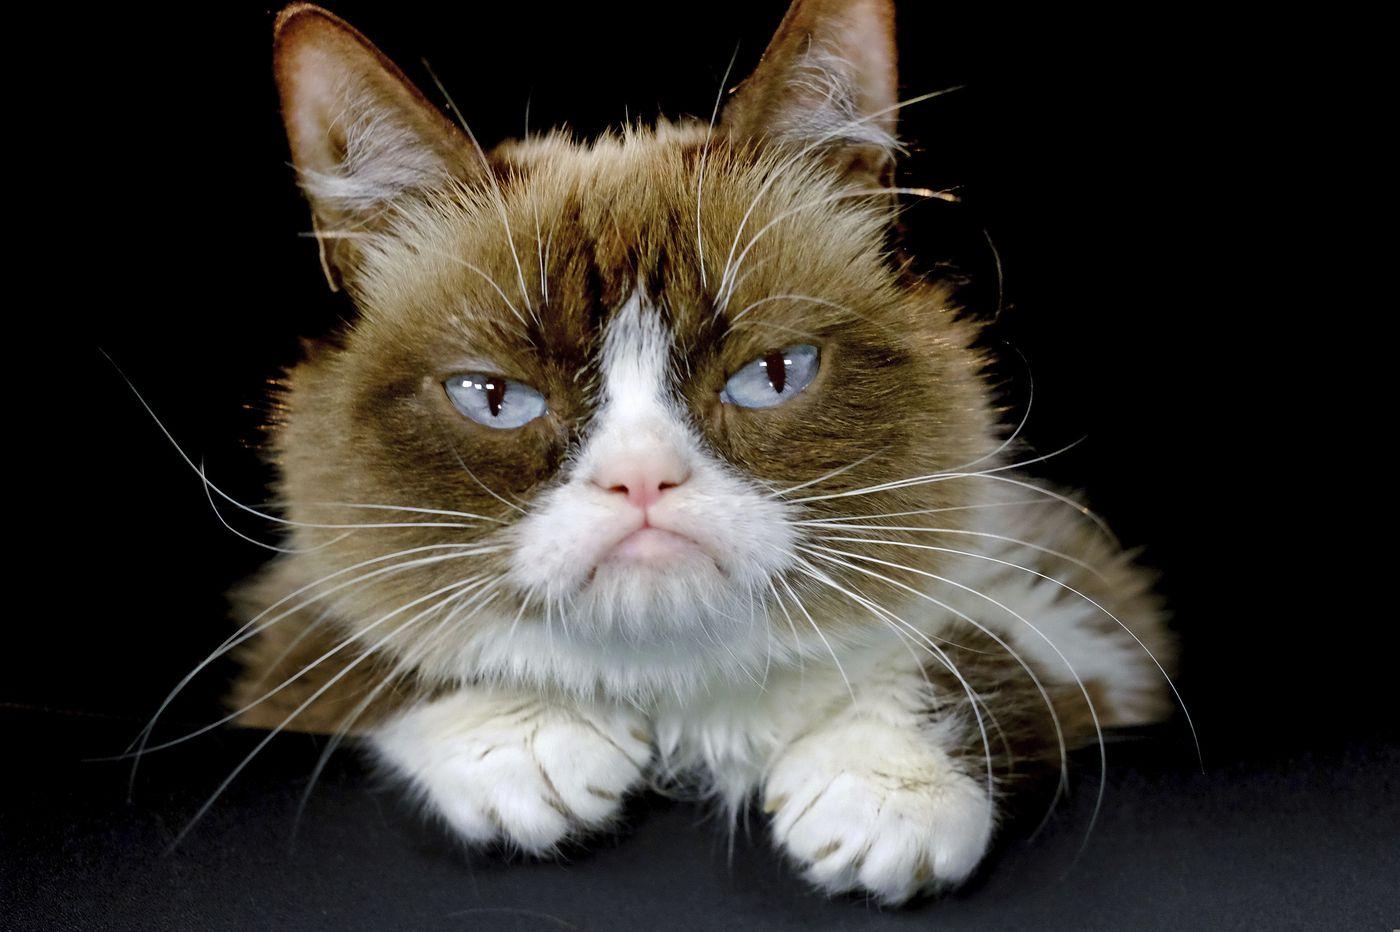 Grumpy Cat, the internet sensation, has died